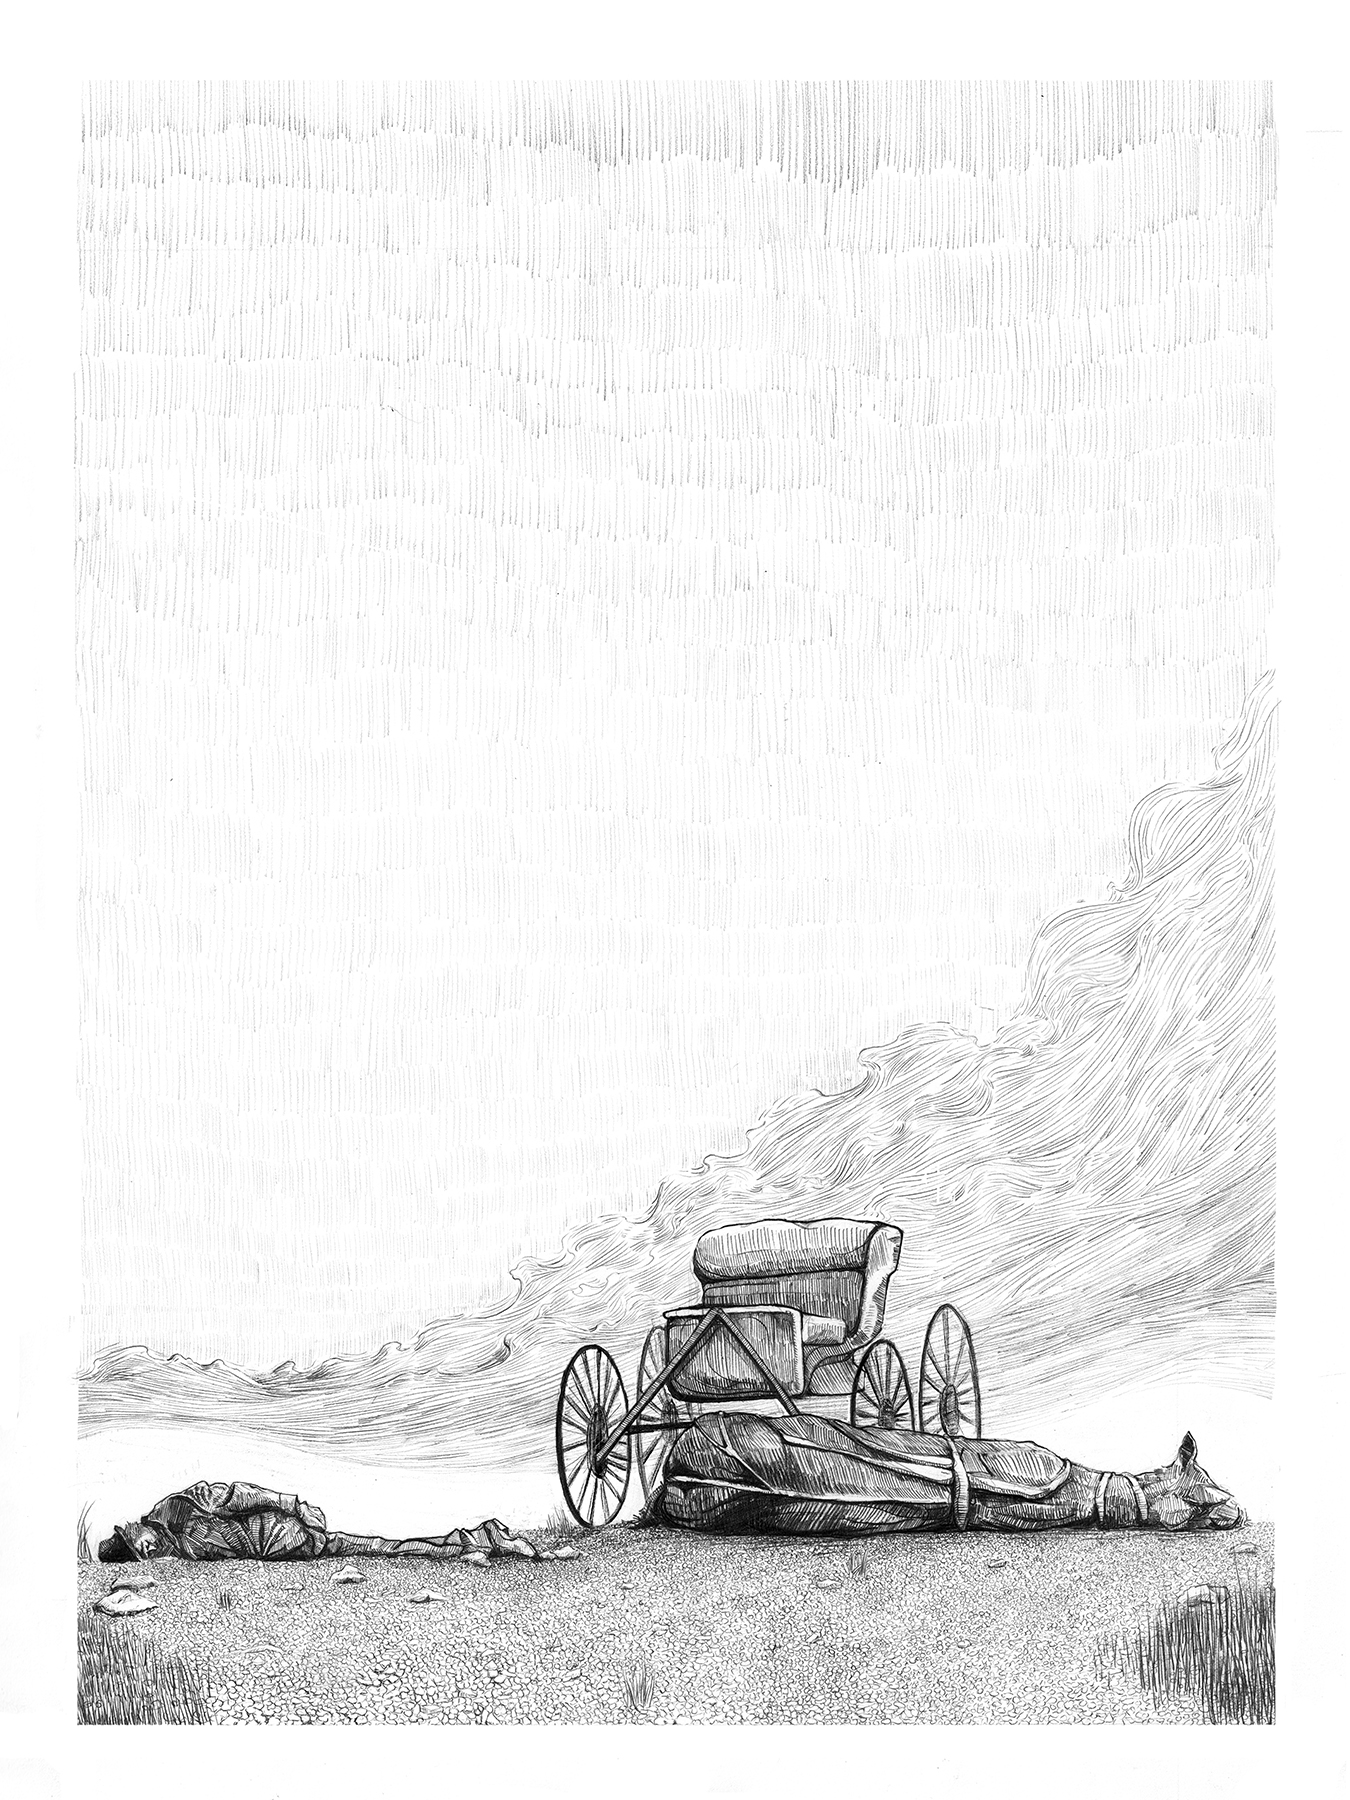 Original Drawing (Graphite on Stonehenge)